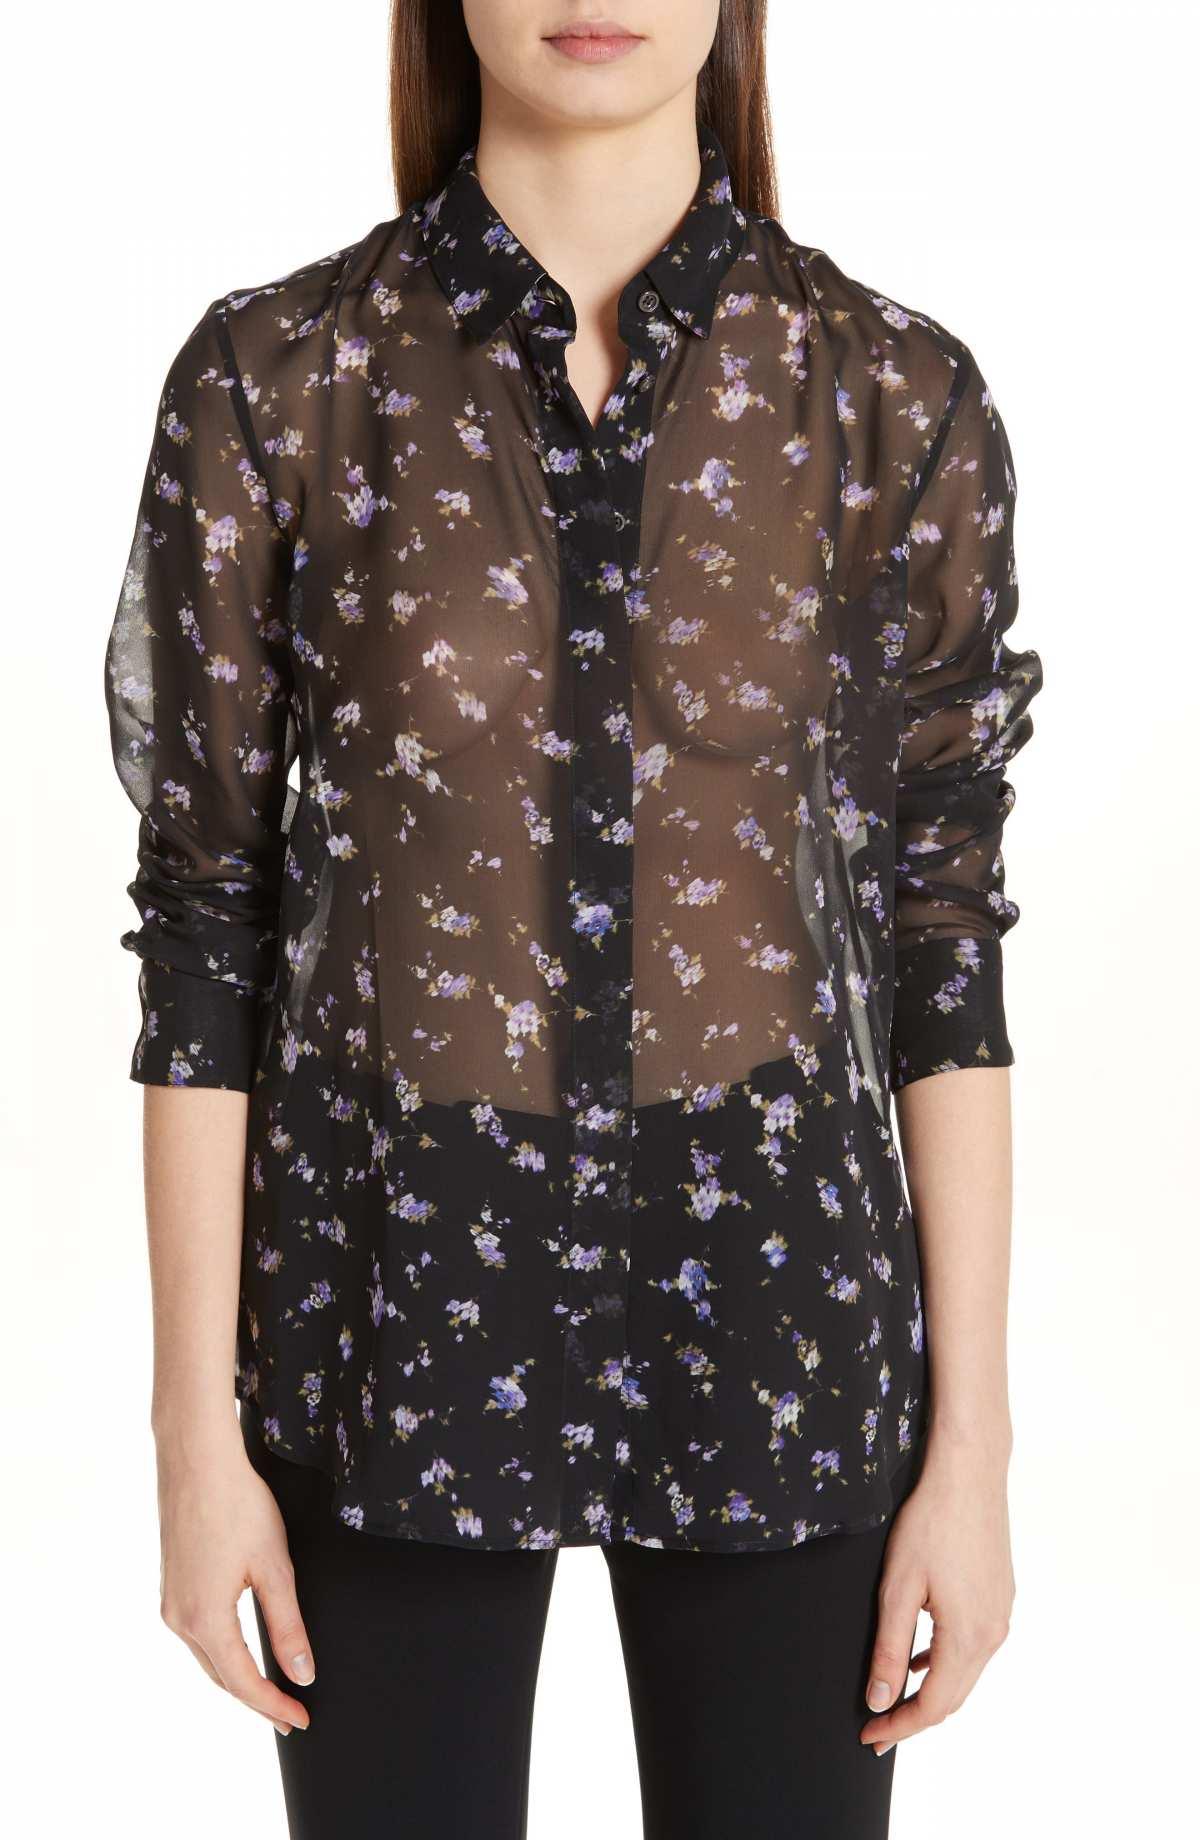 Altuzarra Floral Print Sheer Silk Blouse by ALTUZARRA, available on nordstrom.com for $795 Kendall Jenner Top SIMILAR PRODUCT